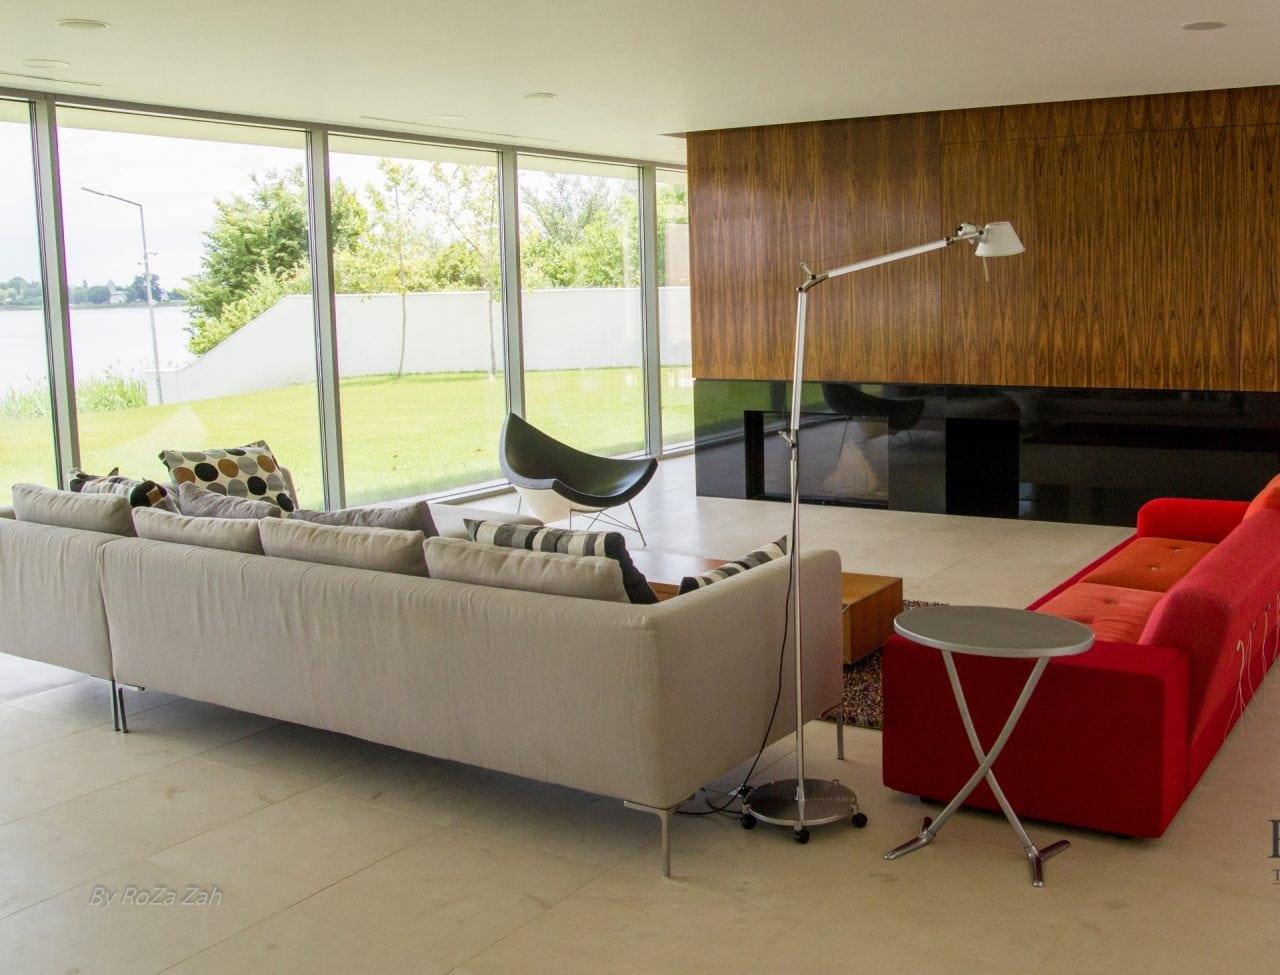 IMG 6792 - Casa de pe lac, lux in stil minimalist